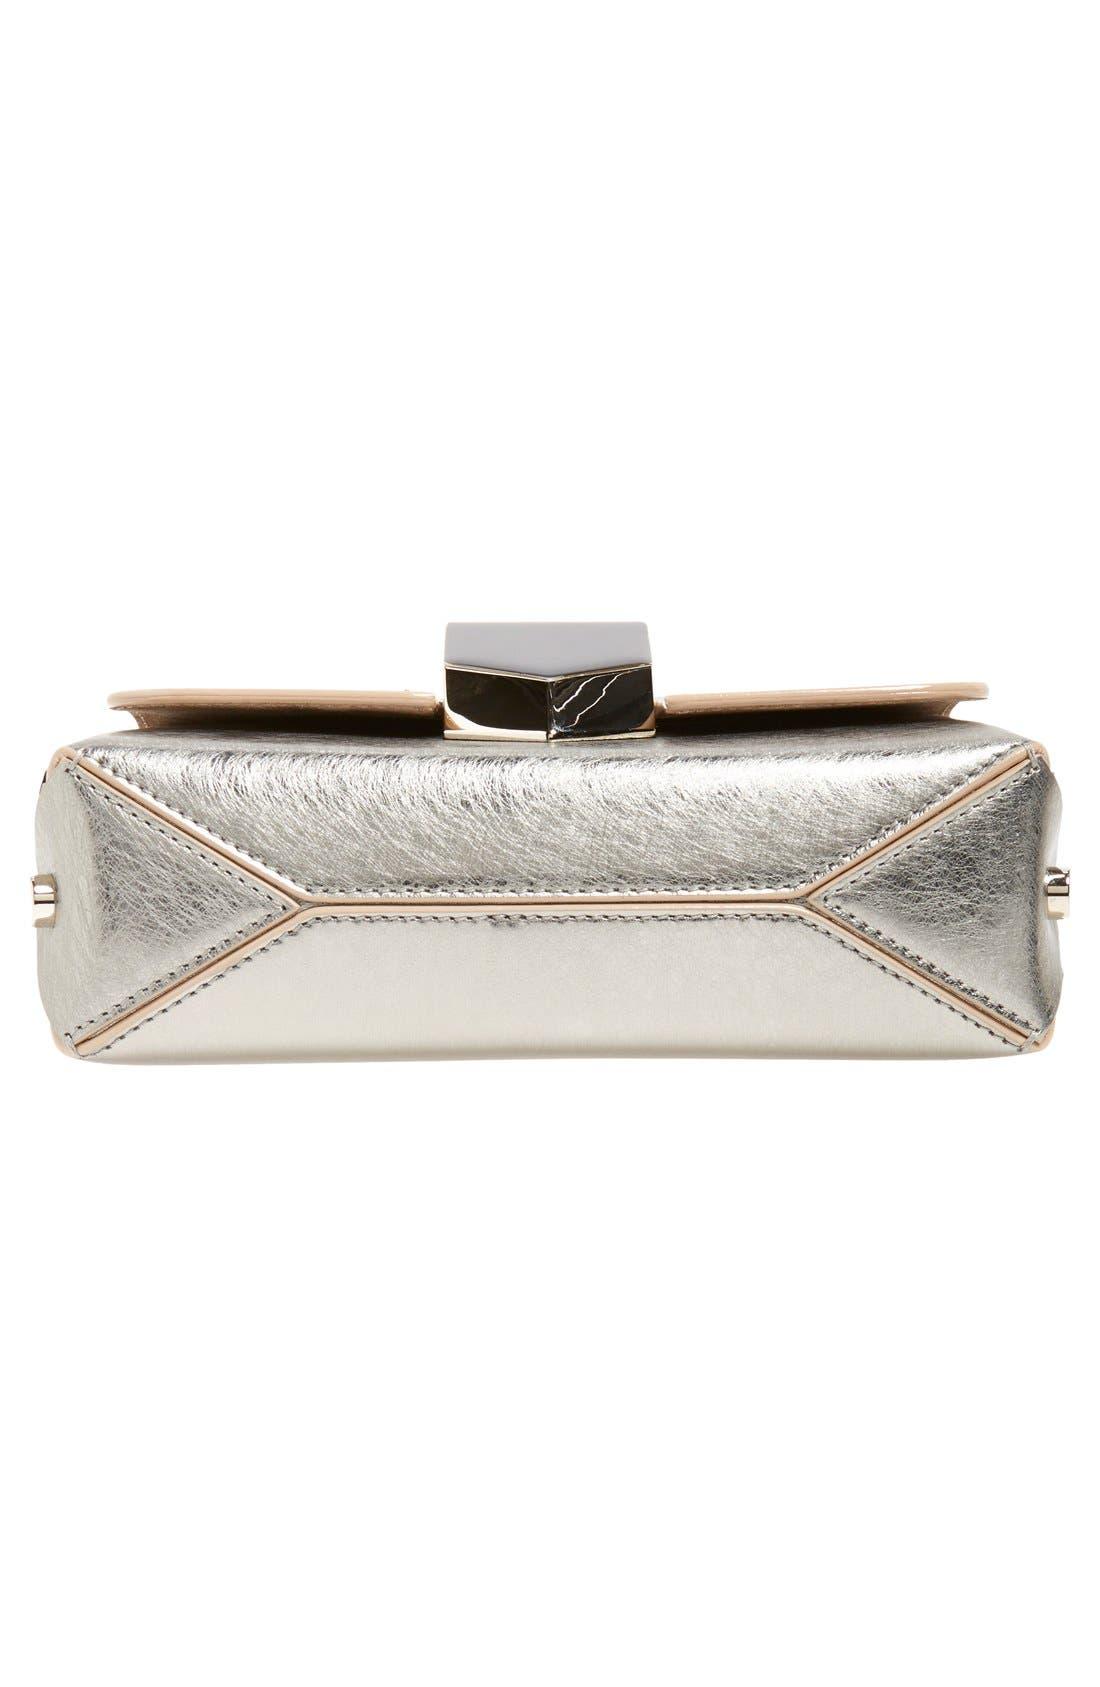 'Lockett Petite' Metallic Leather Shoulder Bag,                             Alternate thumbnail 12, color,